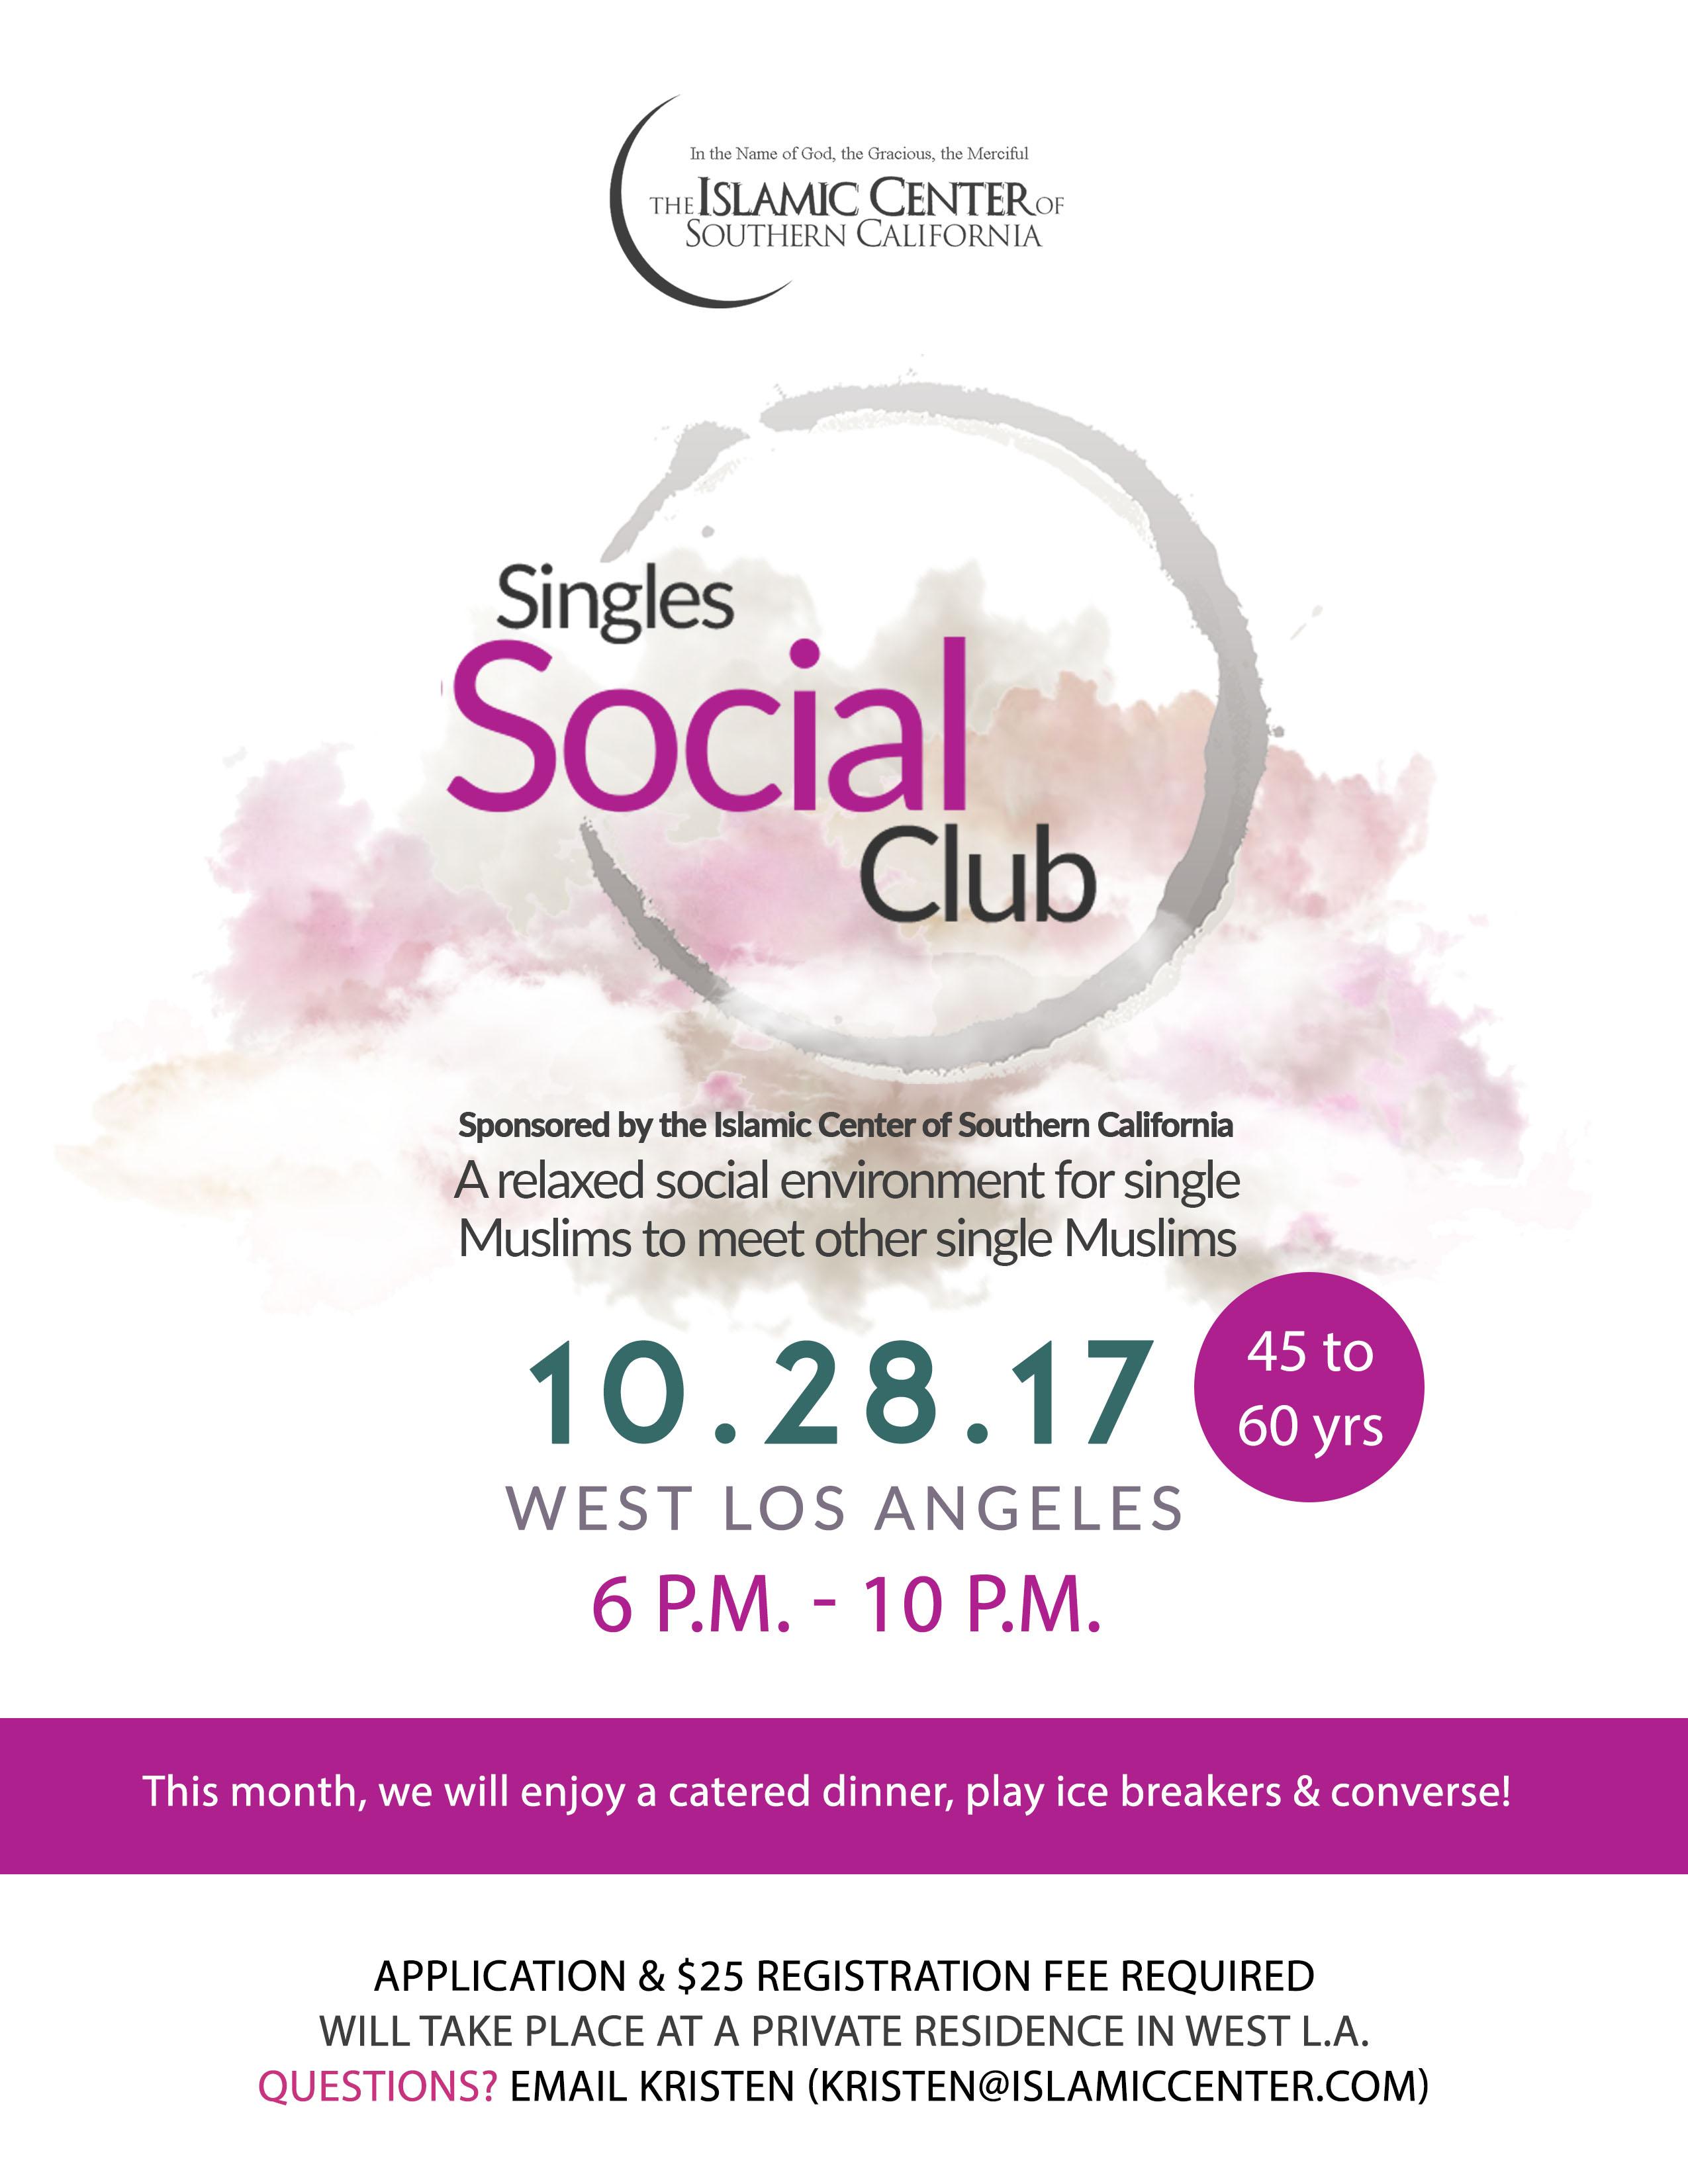 Singles Social Club - Islamic Center of Southern California